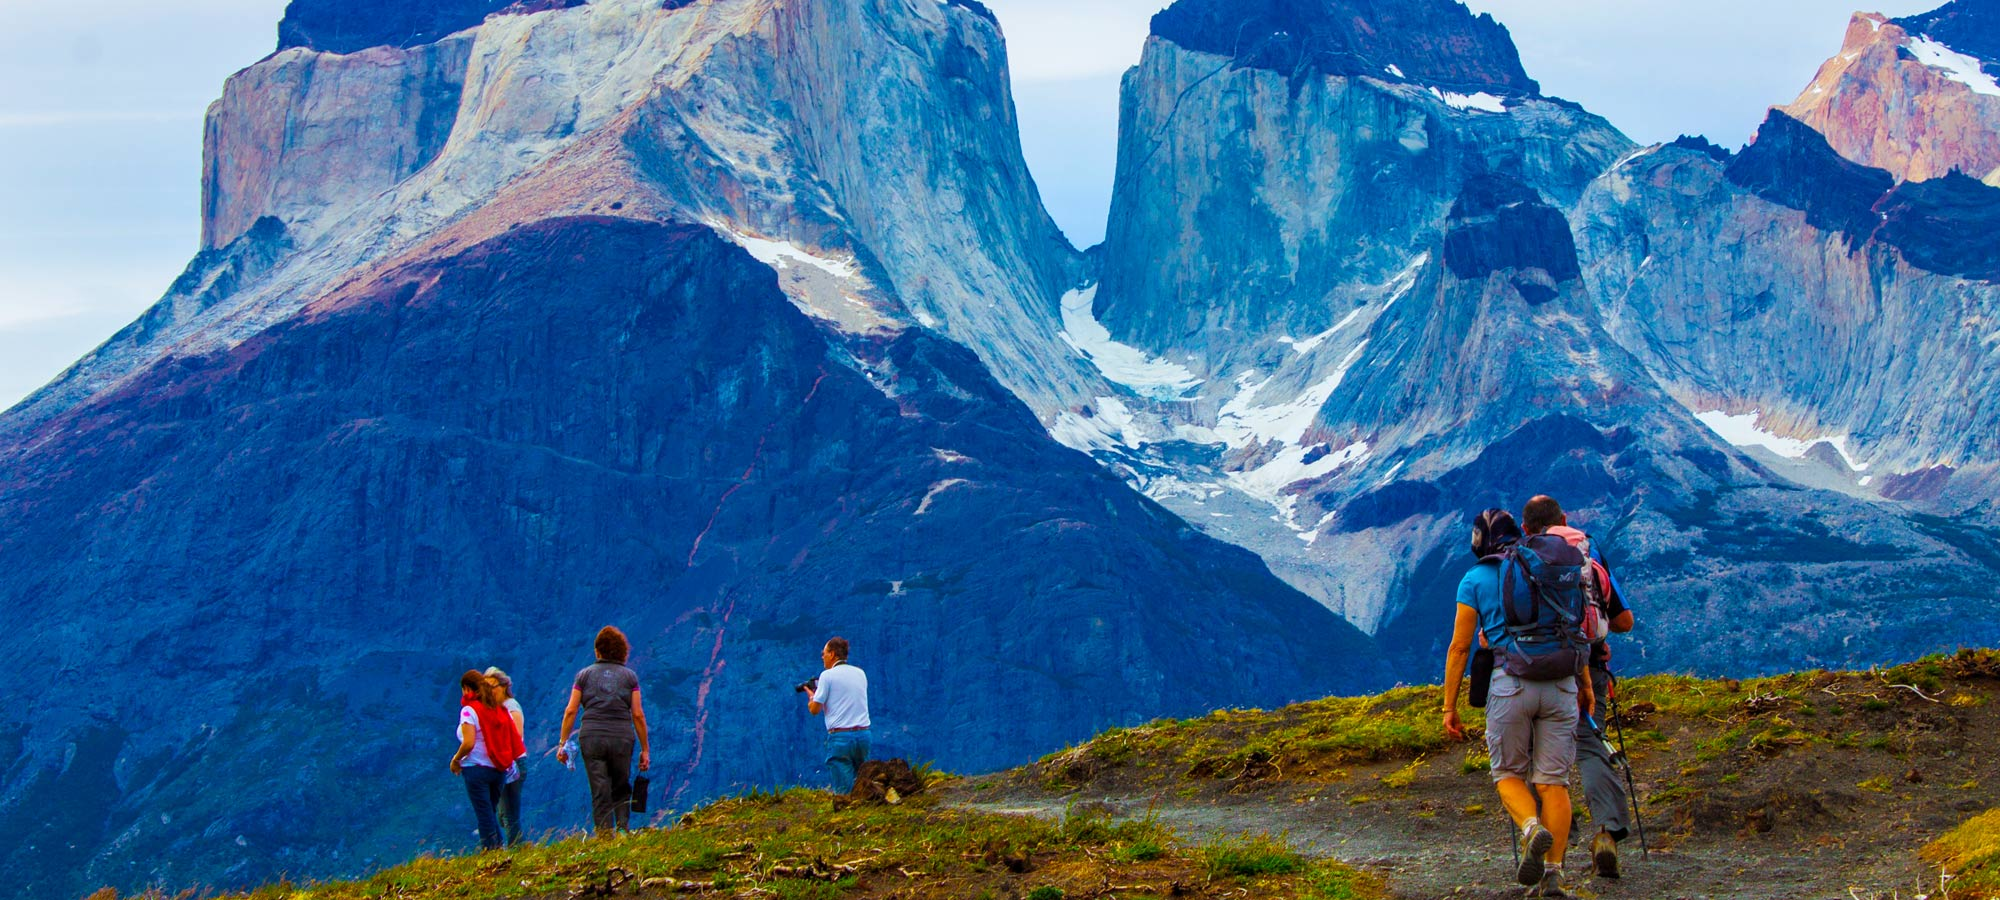 how to get to parque nacional torres del paine